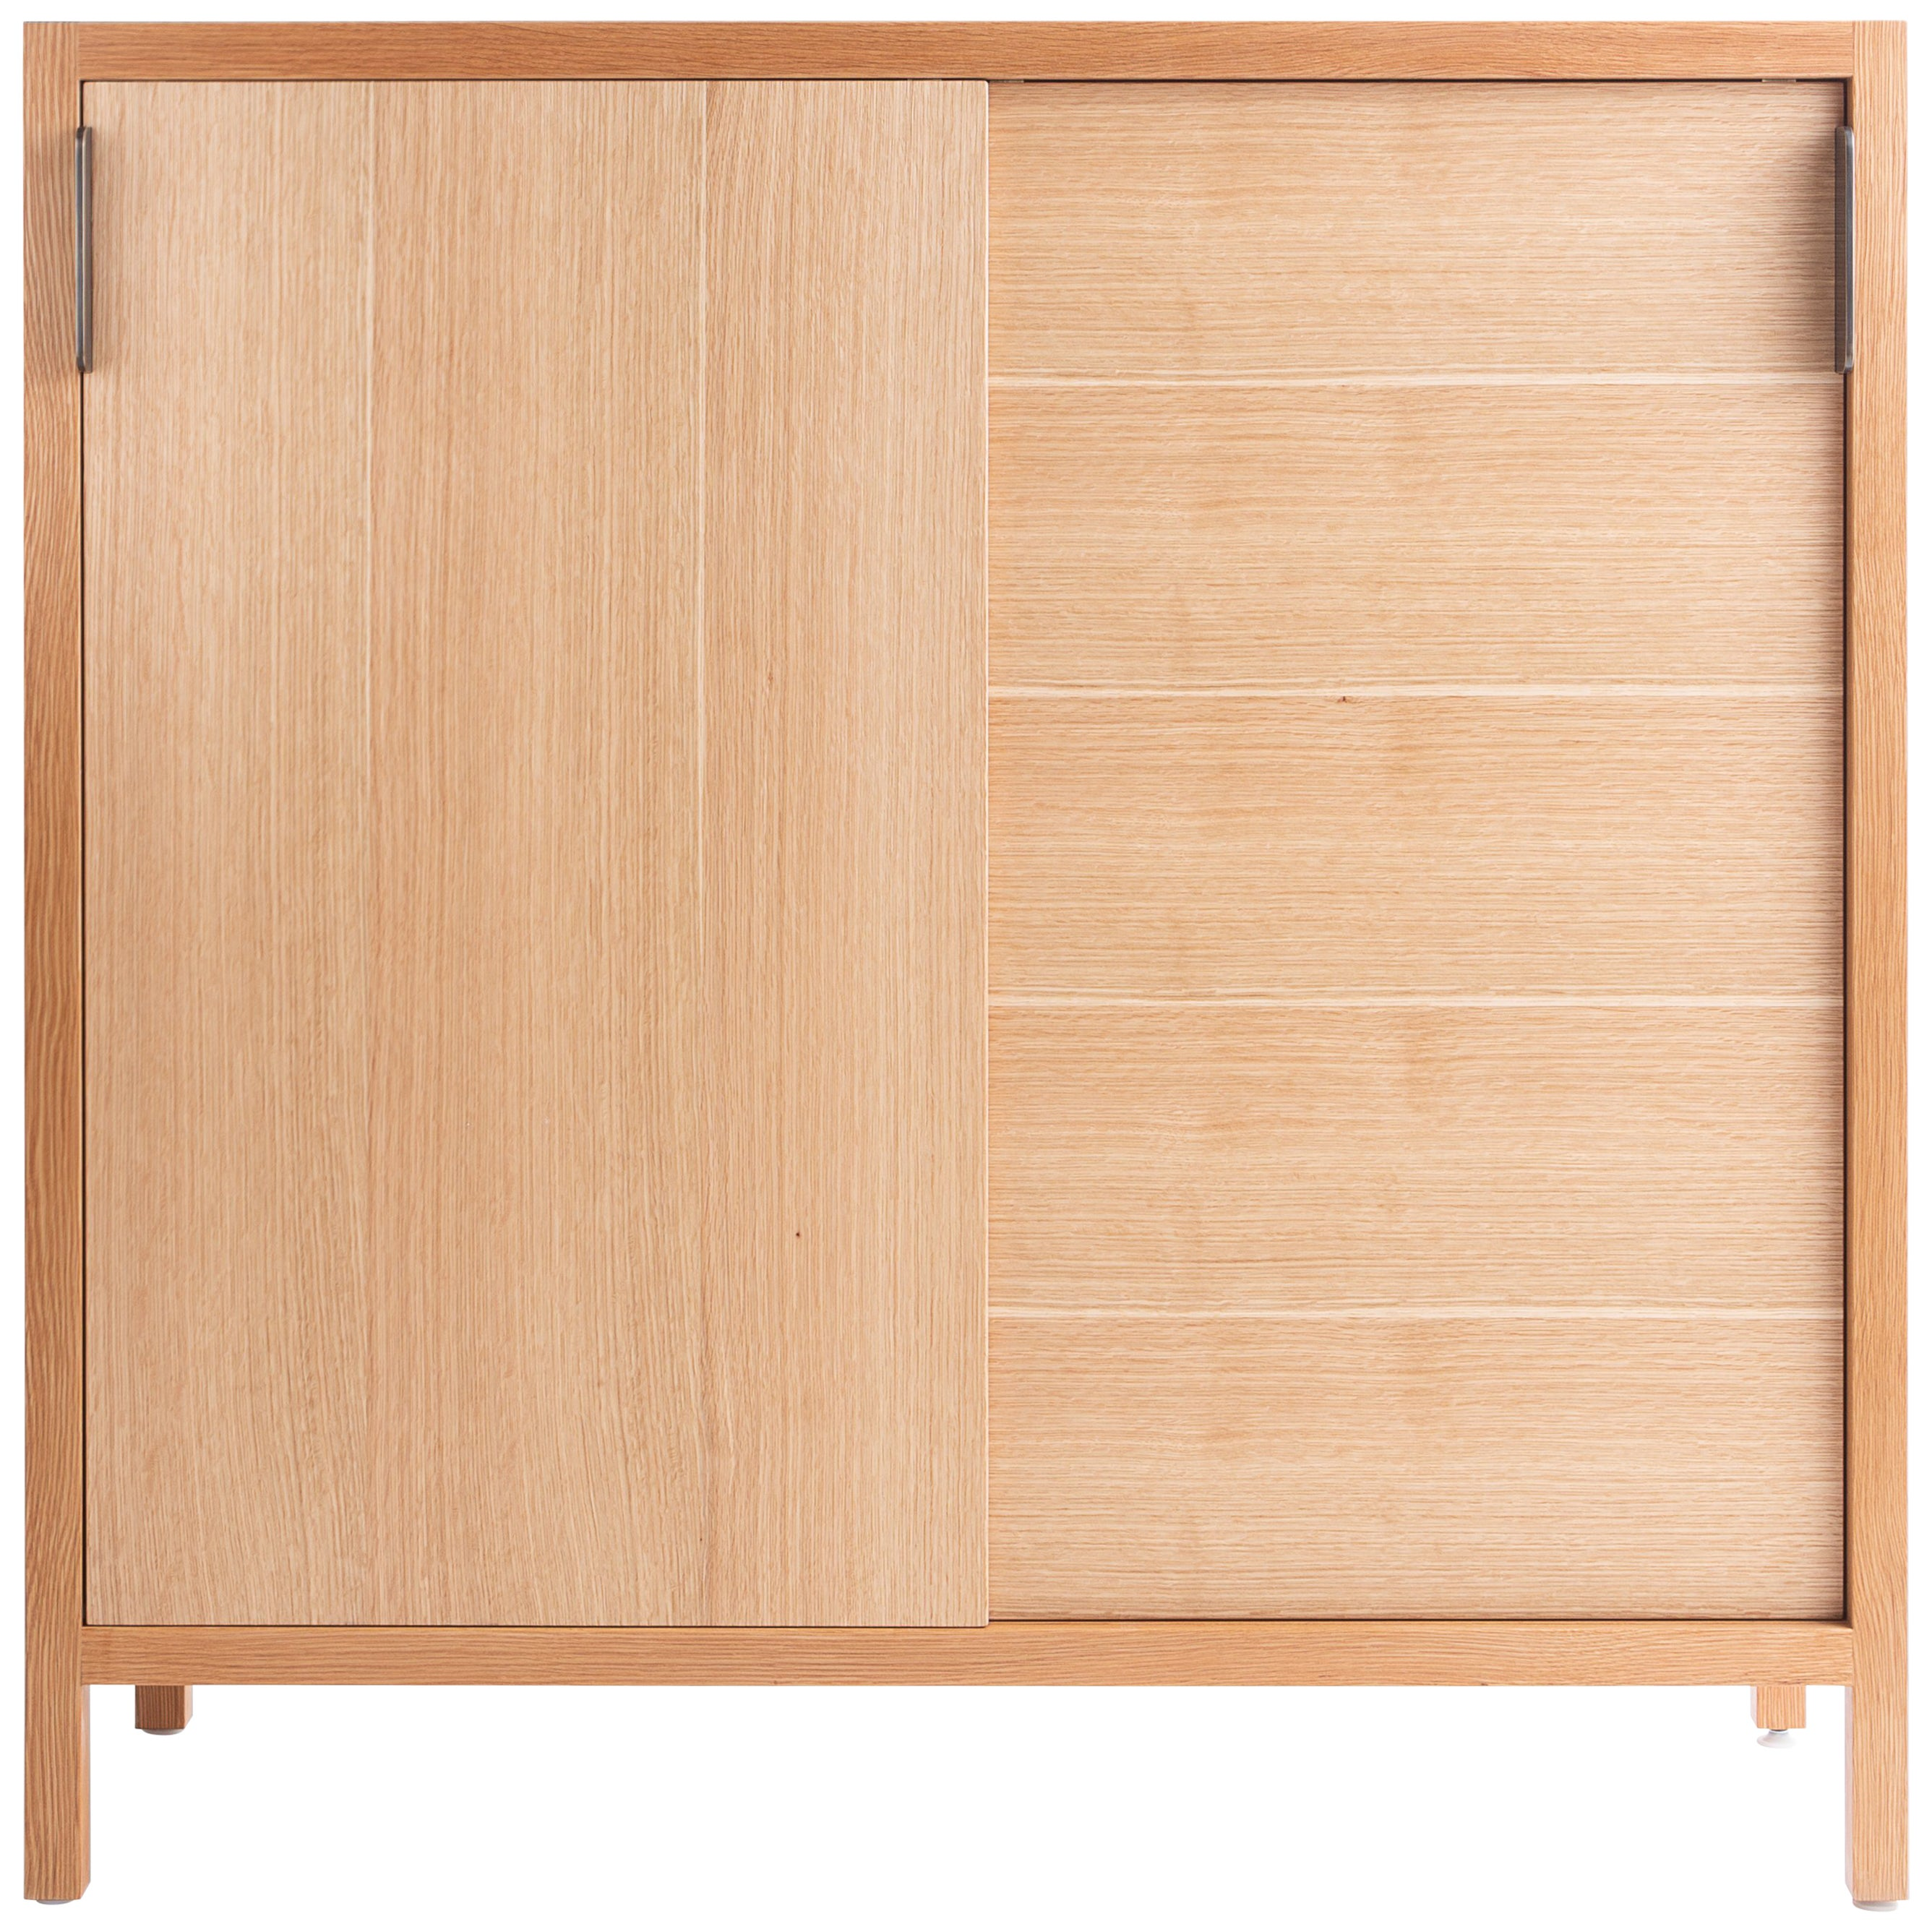 Laska Credenza in Quarter-Sawn White Oak, Sliding Doors, Customizable